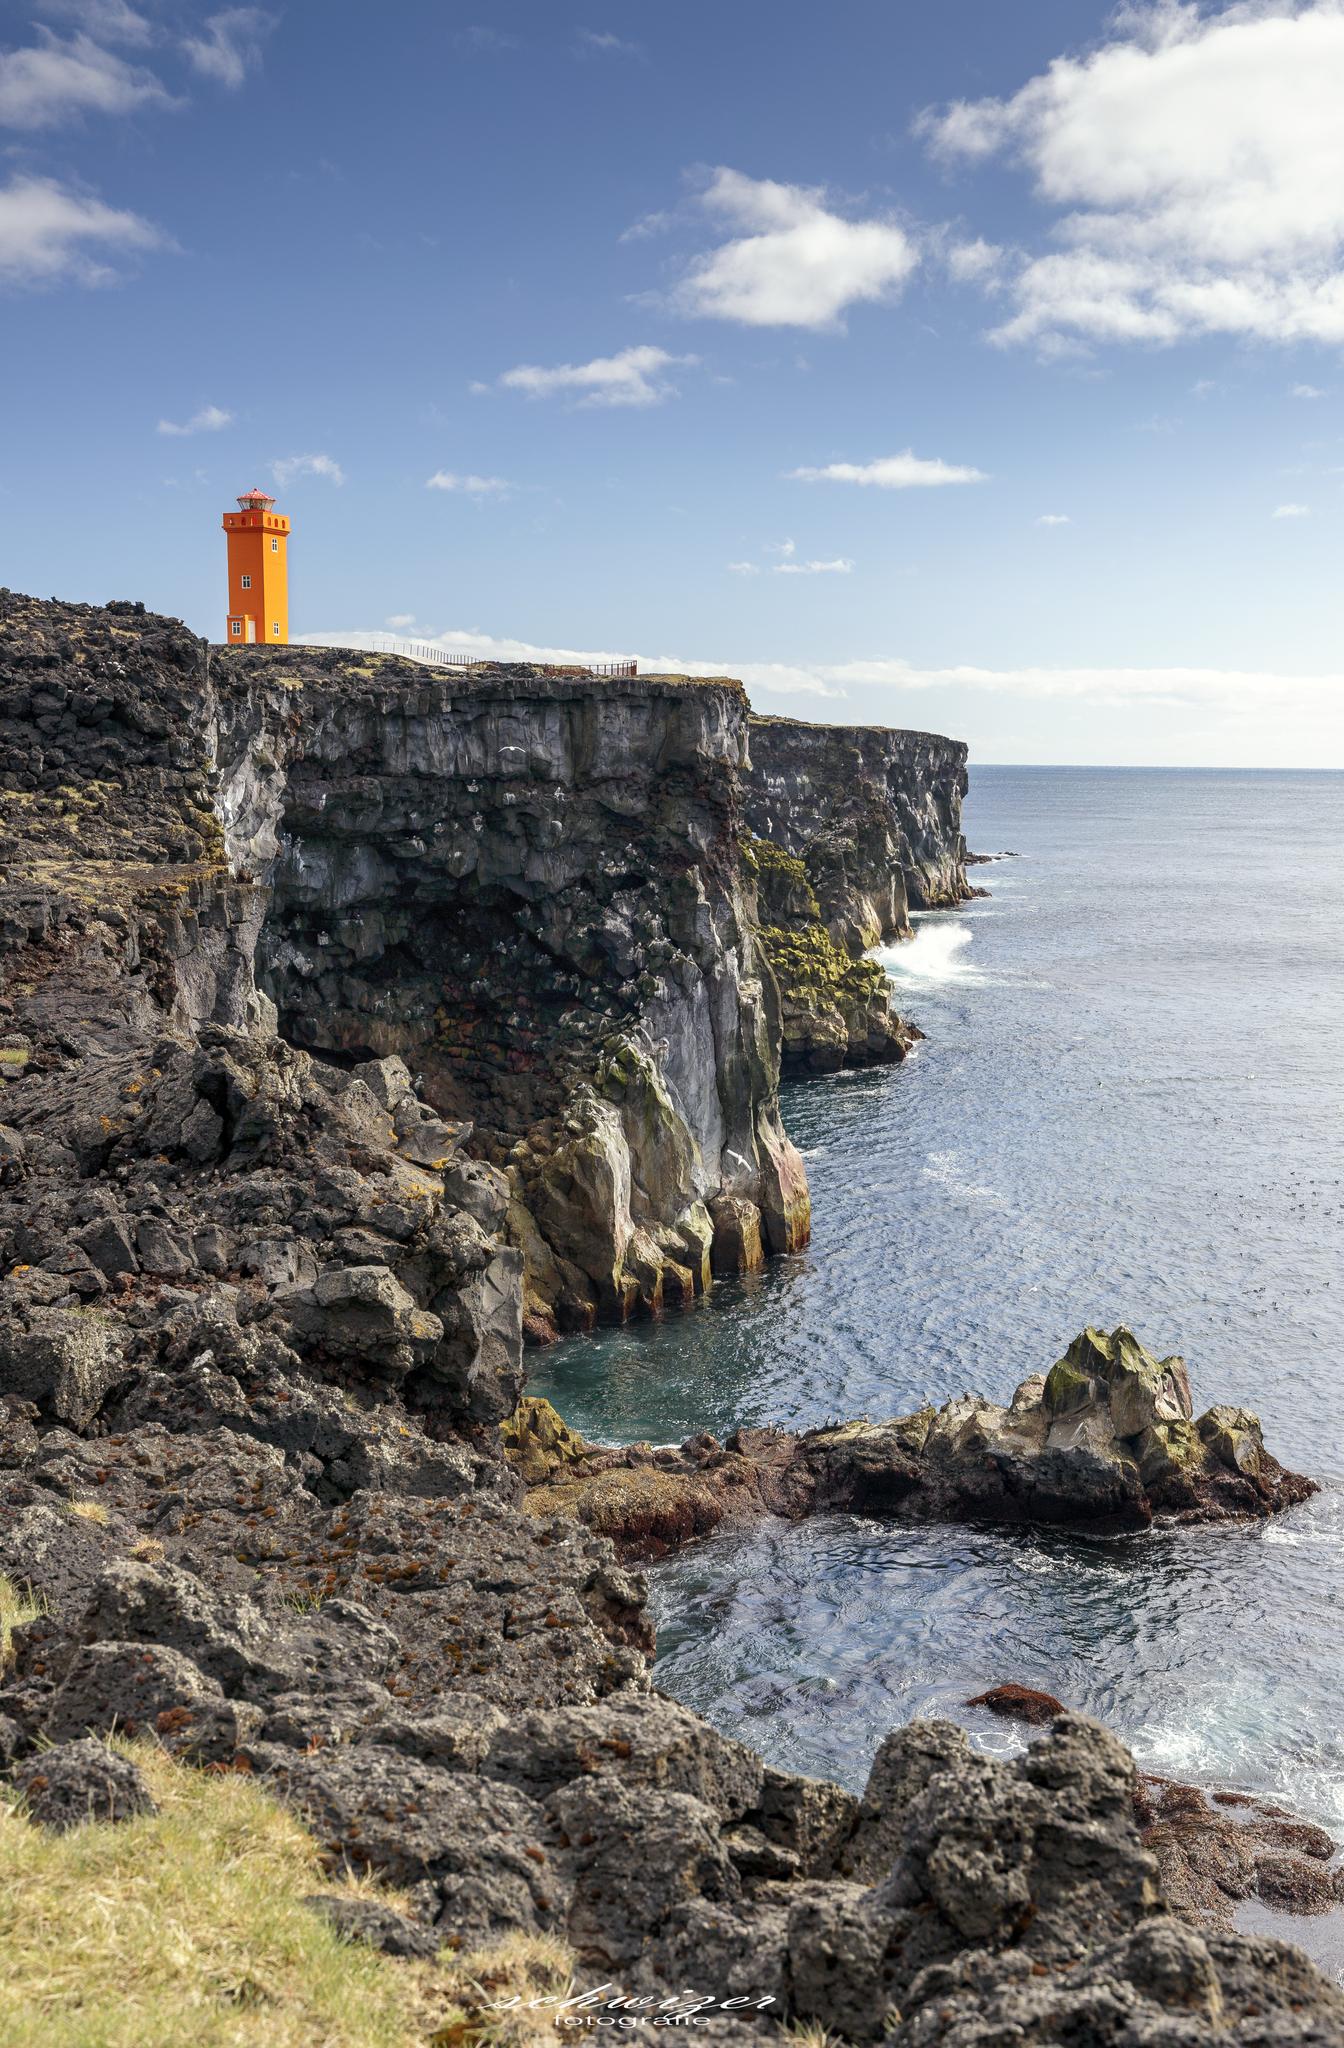 Küste mit Leuchtturm Skalasnaga